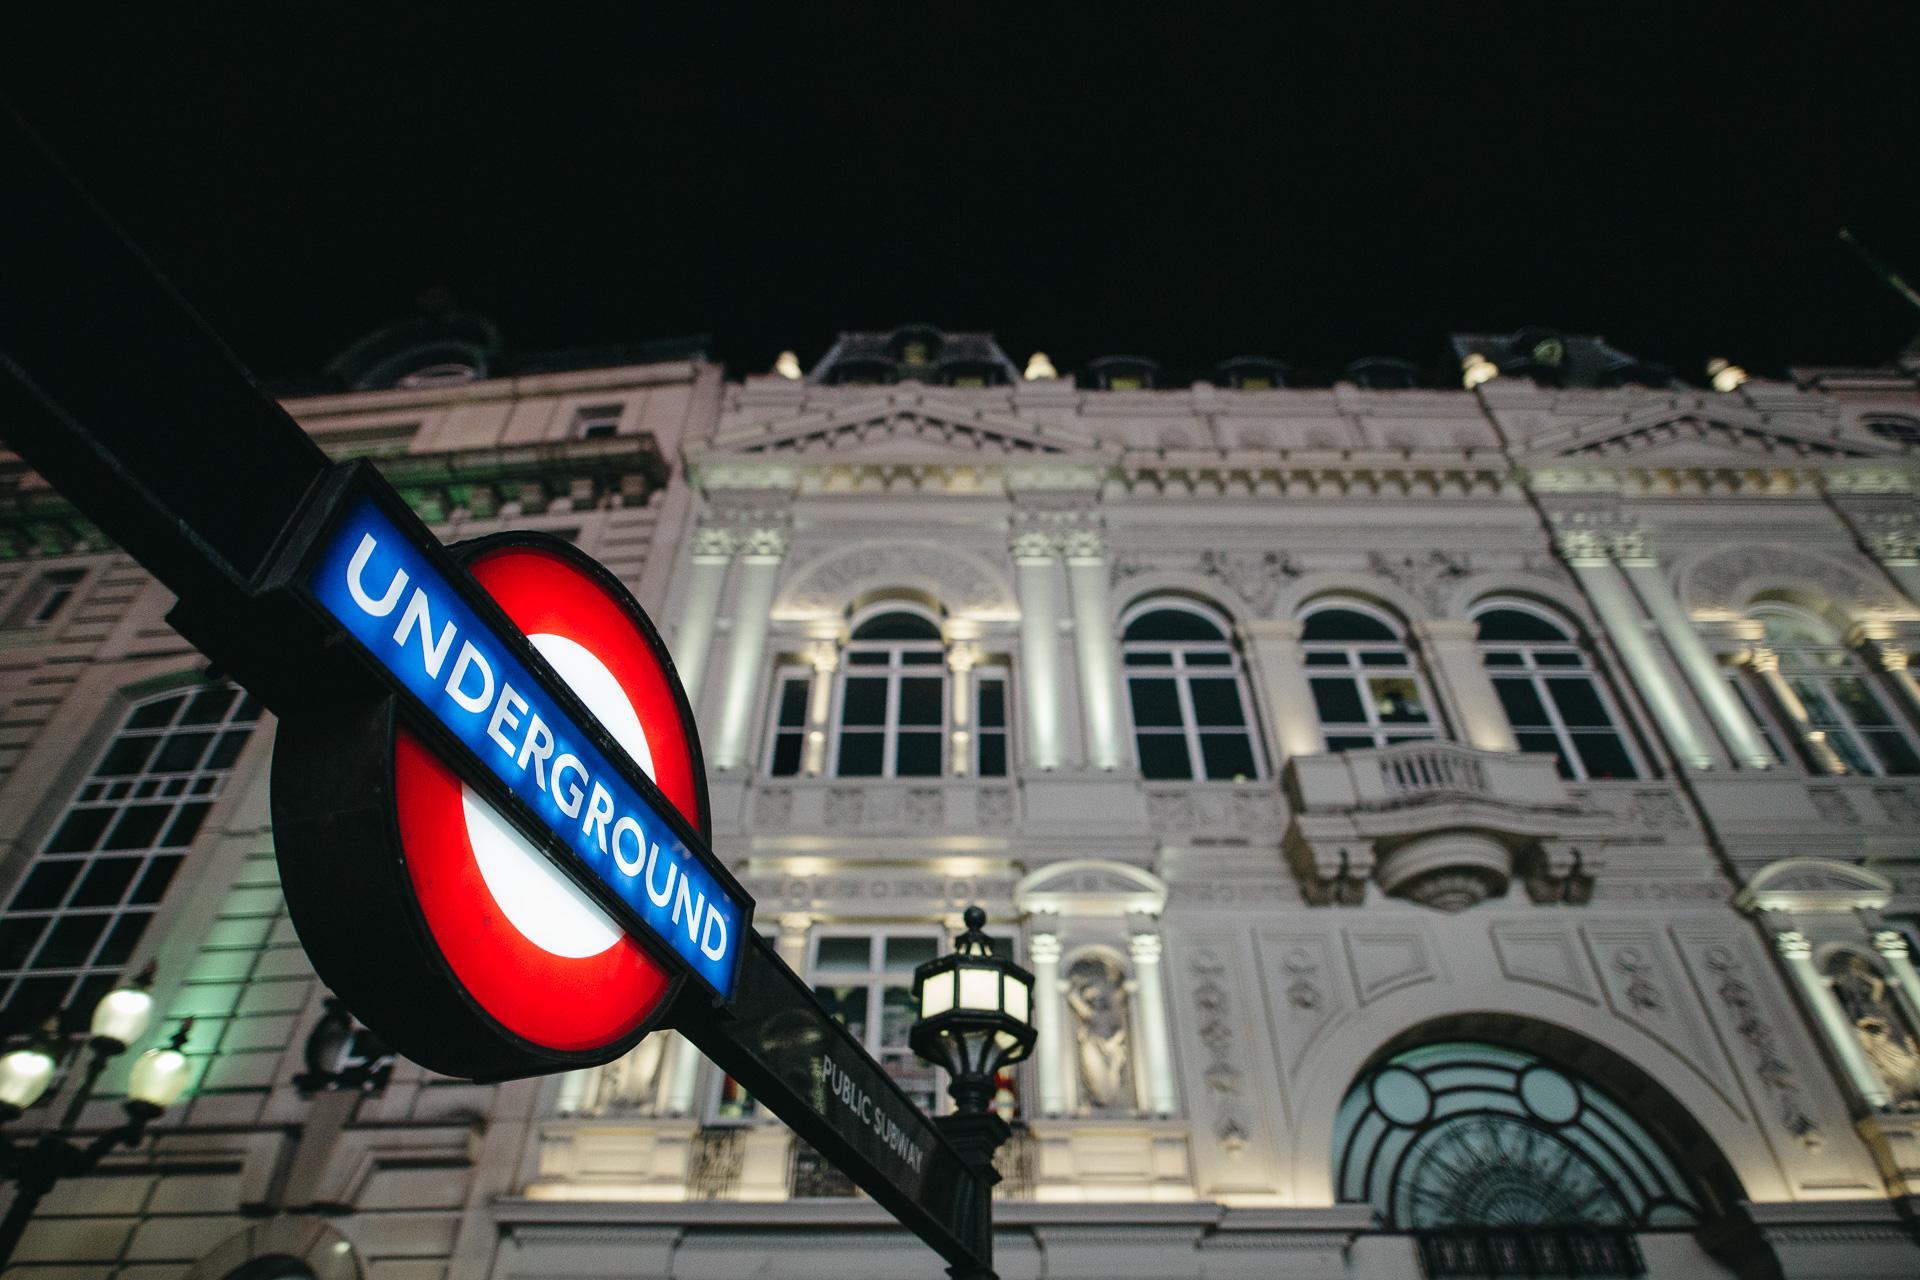 gabor_lenart_london_photographer_street_blogger_lifestyle_img_5229